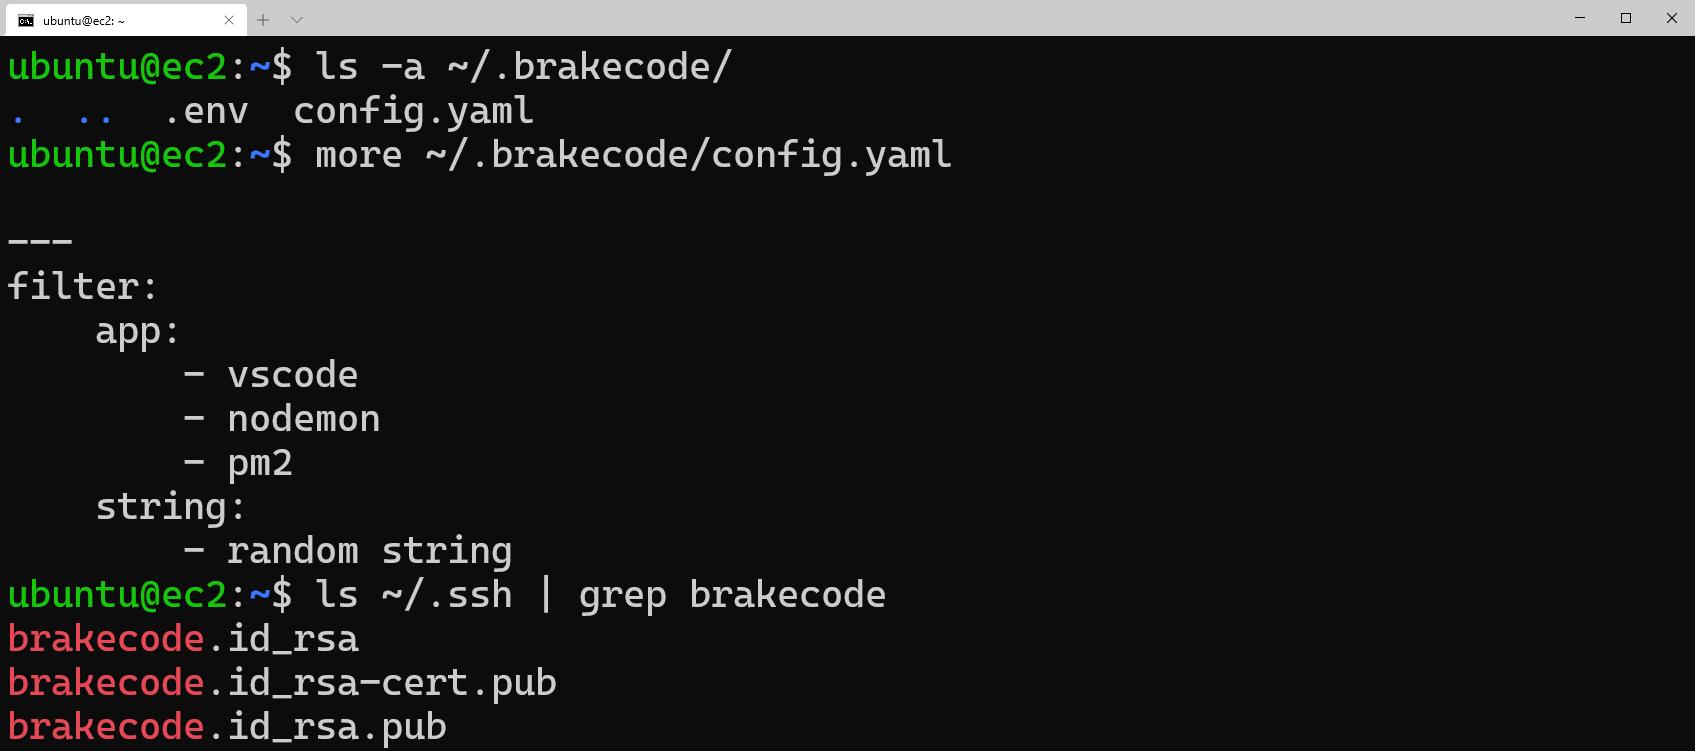 debuggingDenoNode-Screenshot-2020-09-18-131259